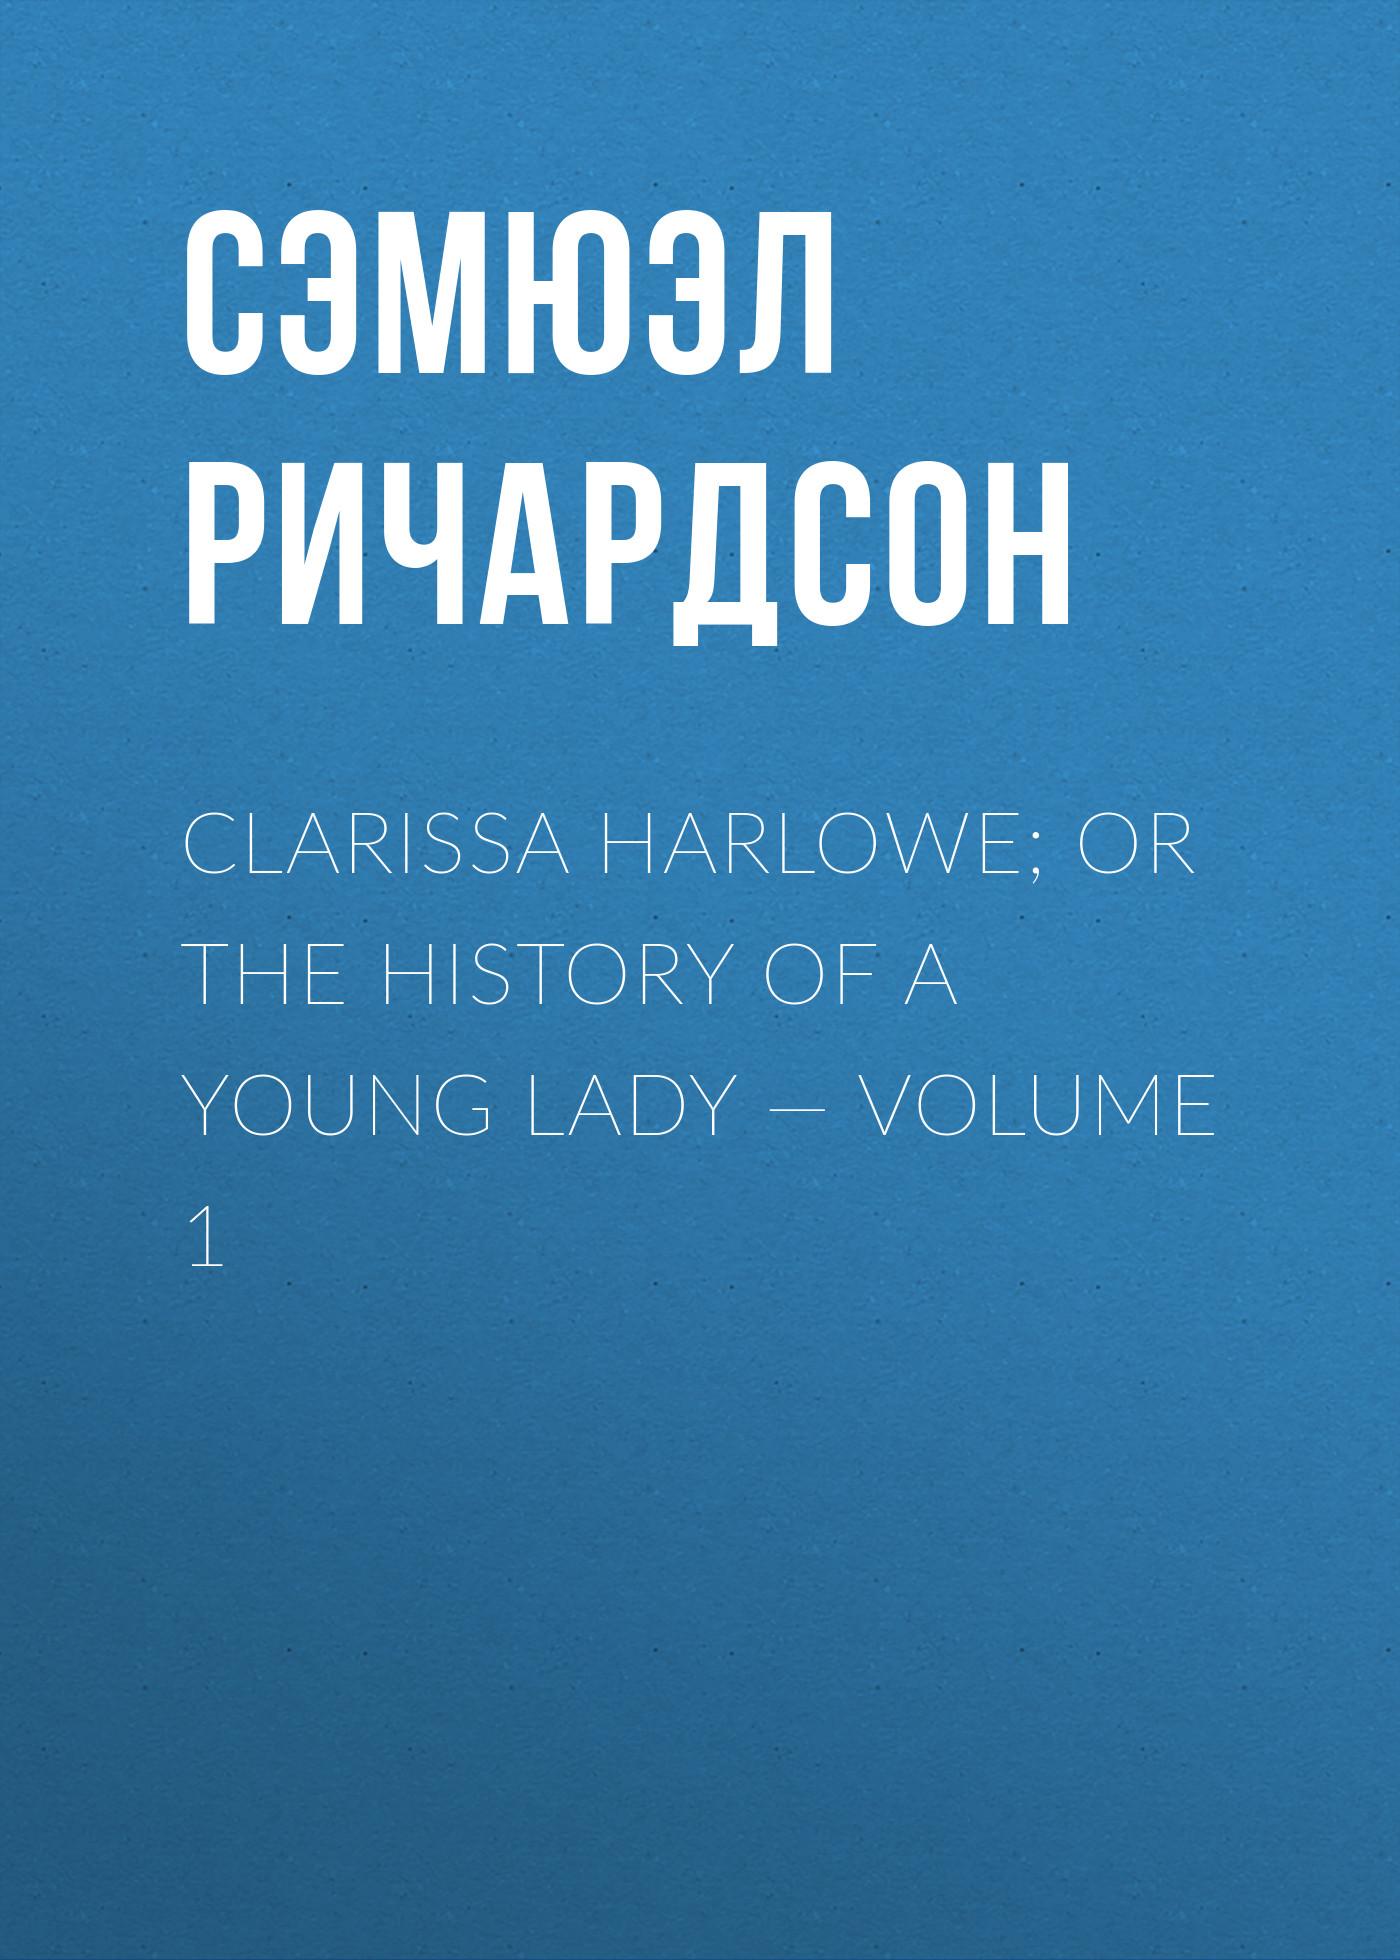 лучшая цена Сэмюэл Ричардсон Clarissa Harlowe; or the history of a young lady — Volume 1